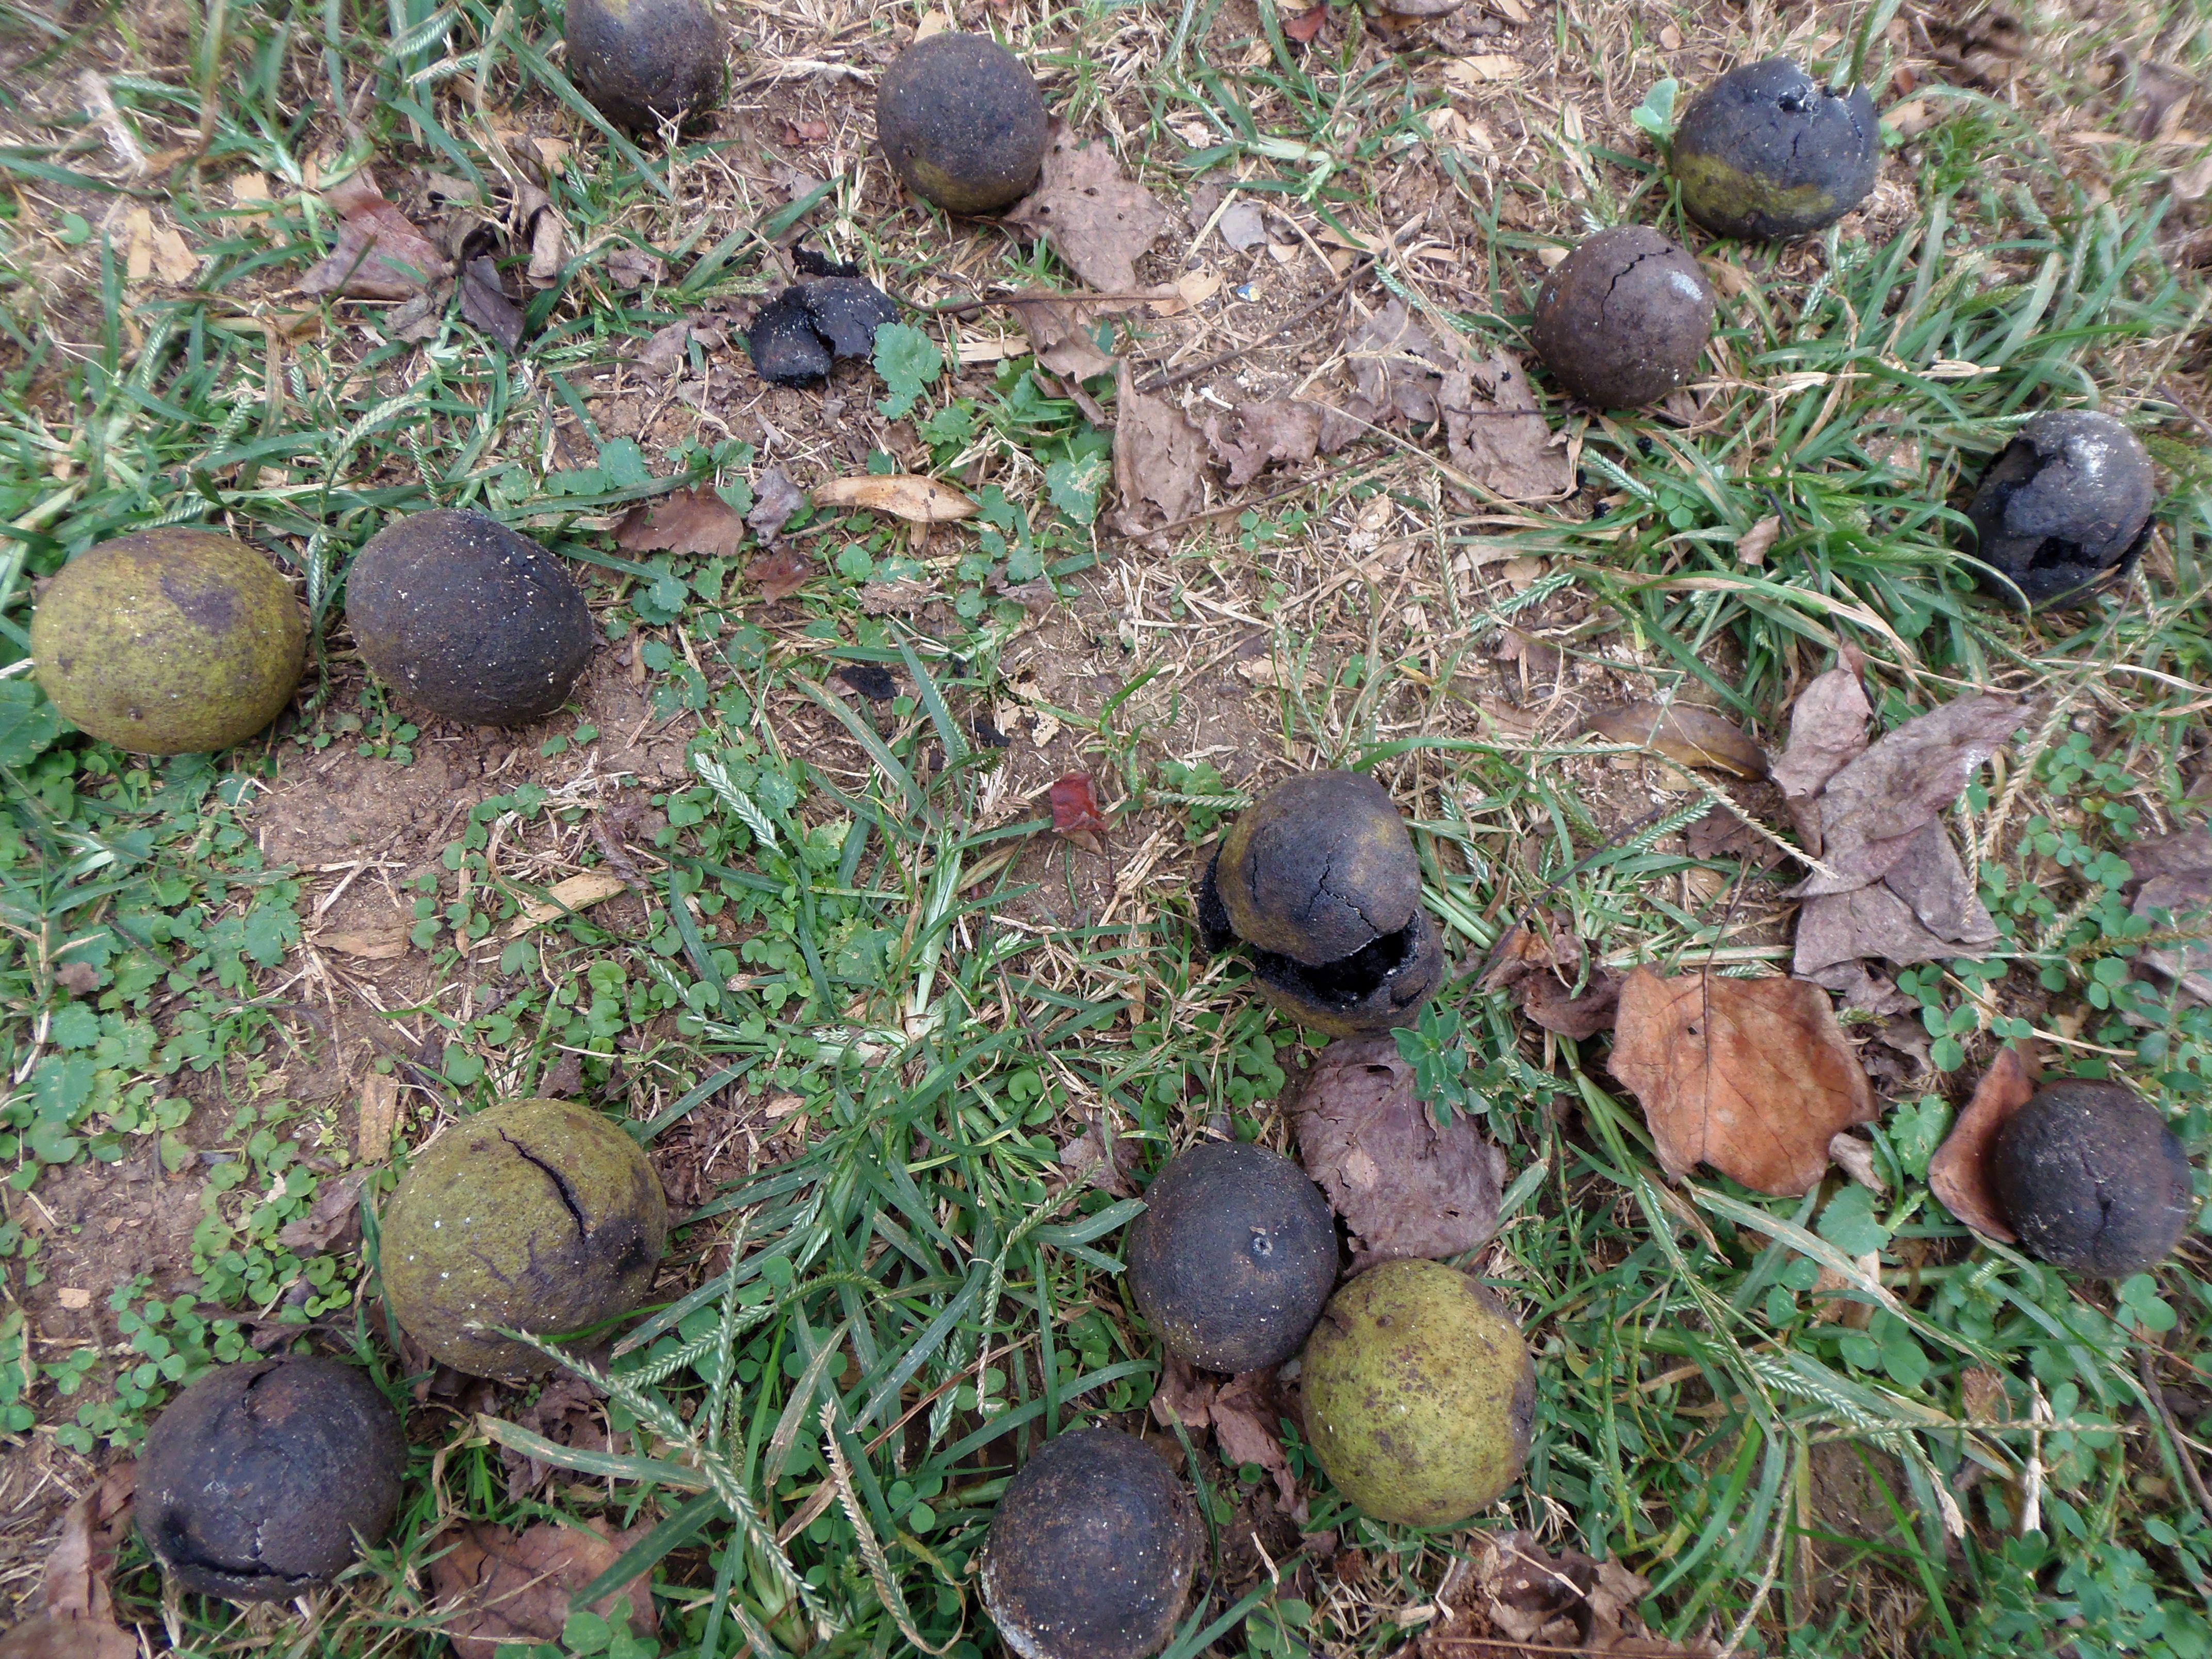 black walnuts on ground